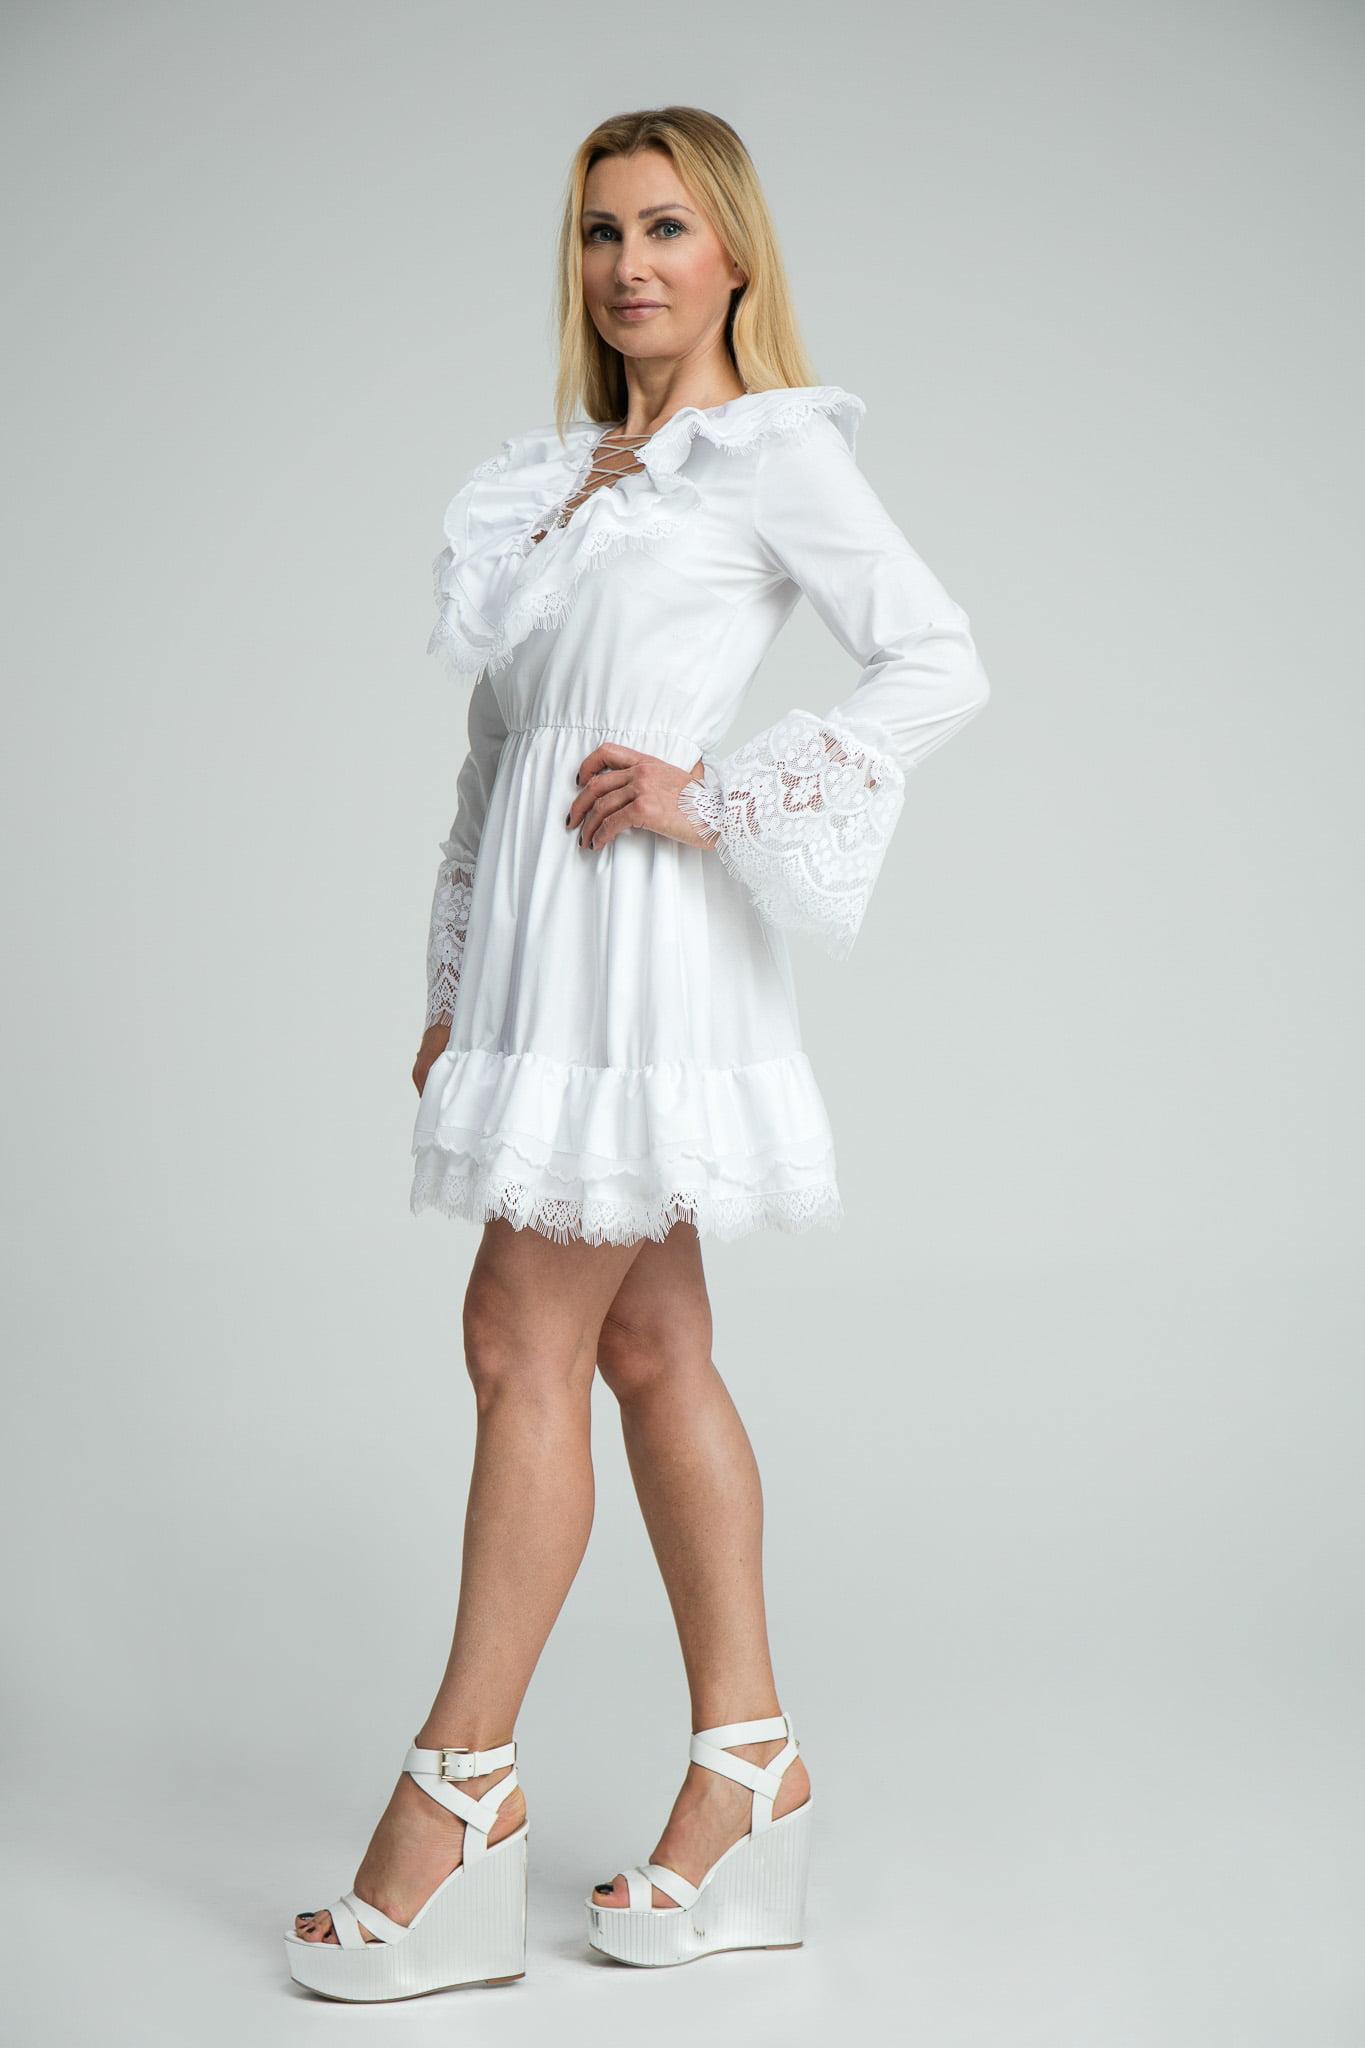 f9b2e8190e Sukienka Priscilla - LuLu by Adriana Okoń